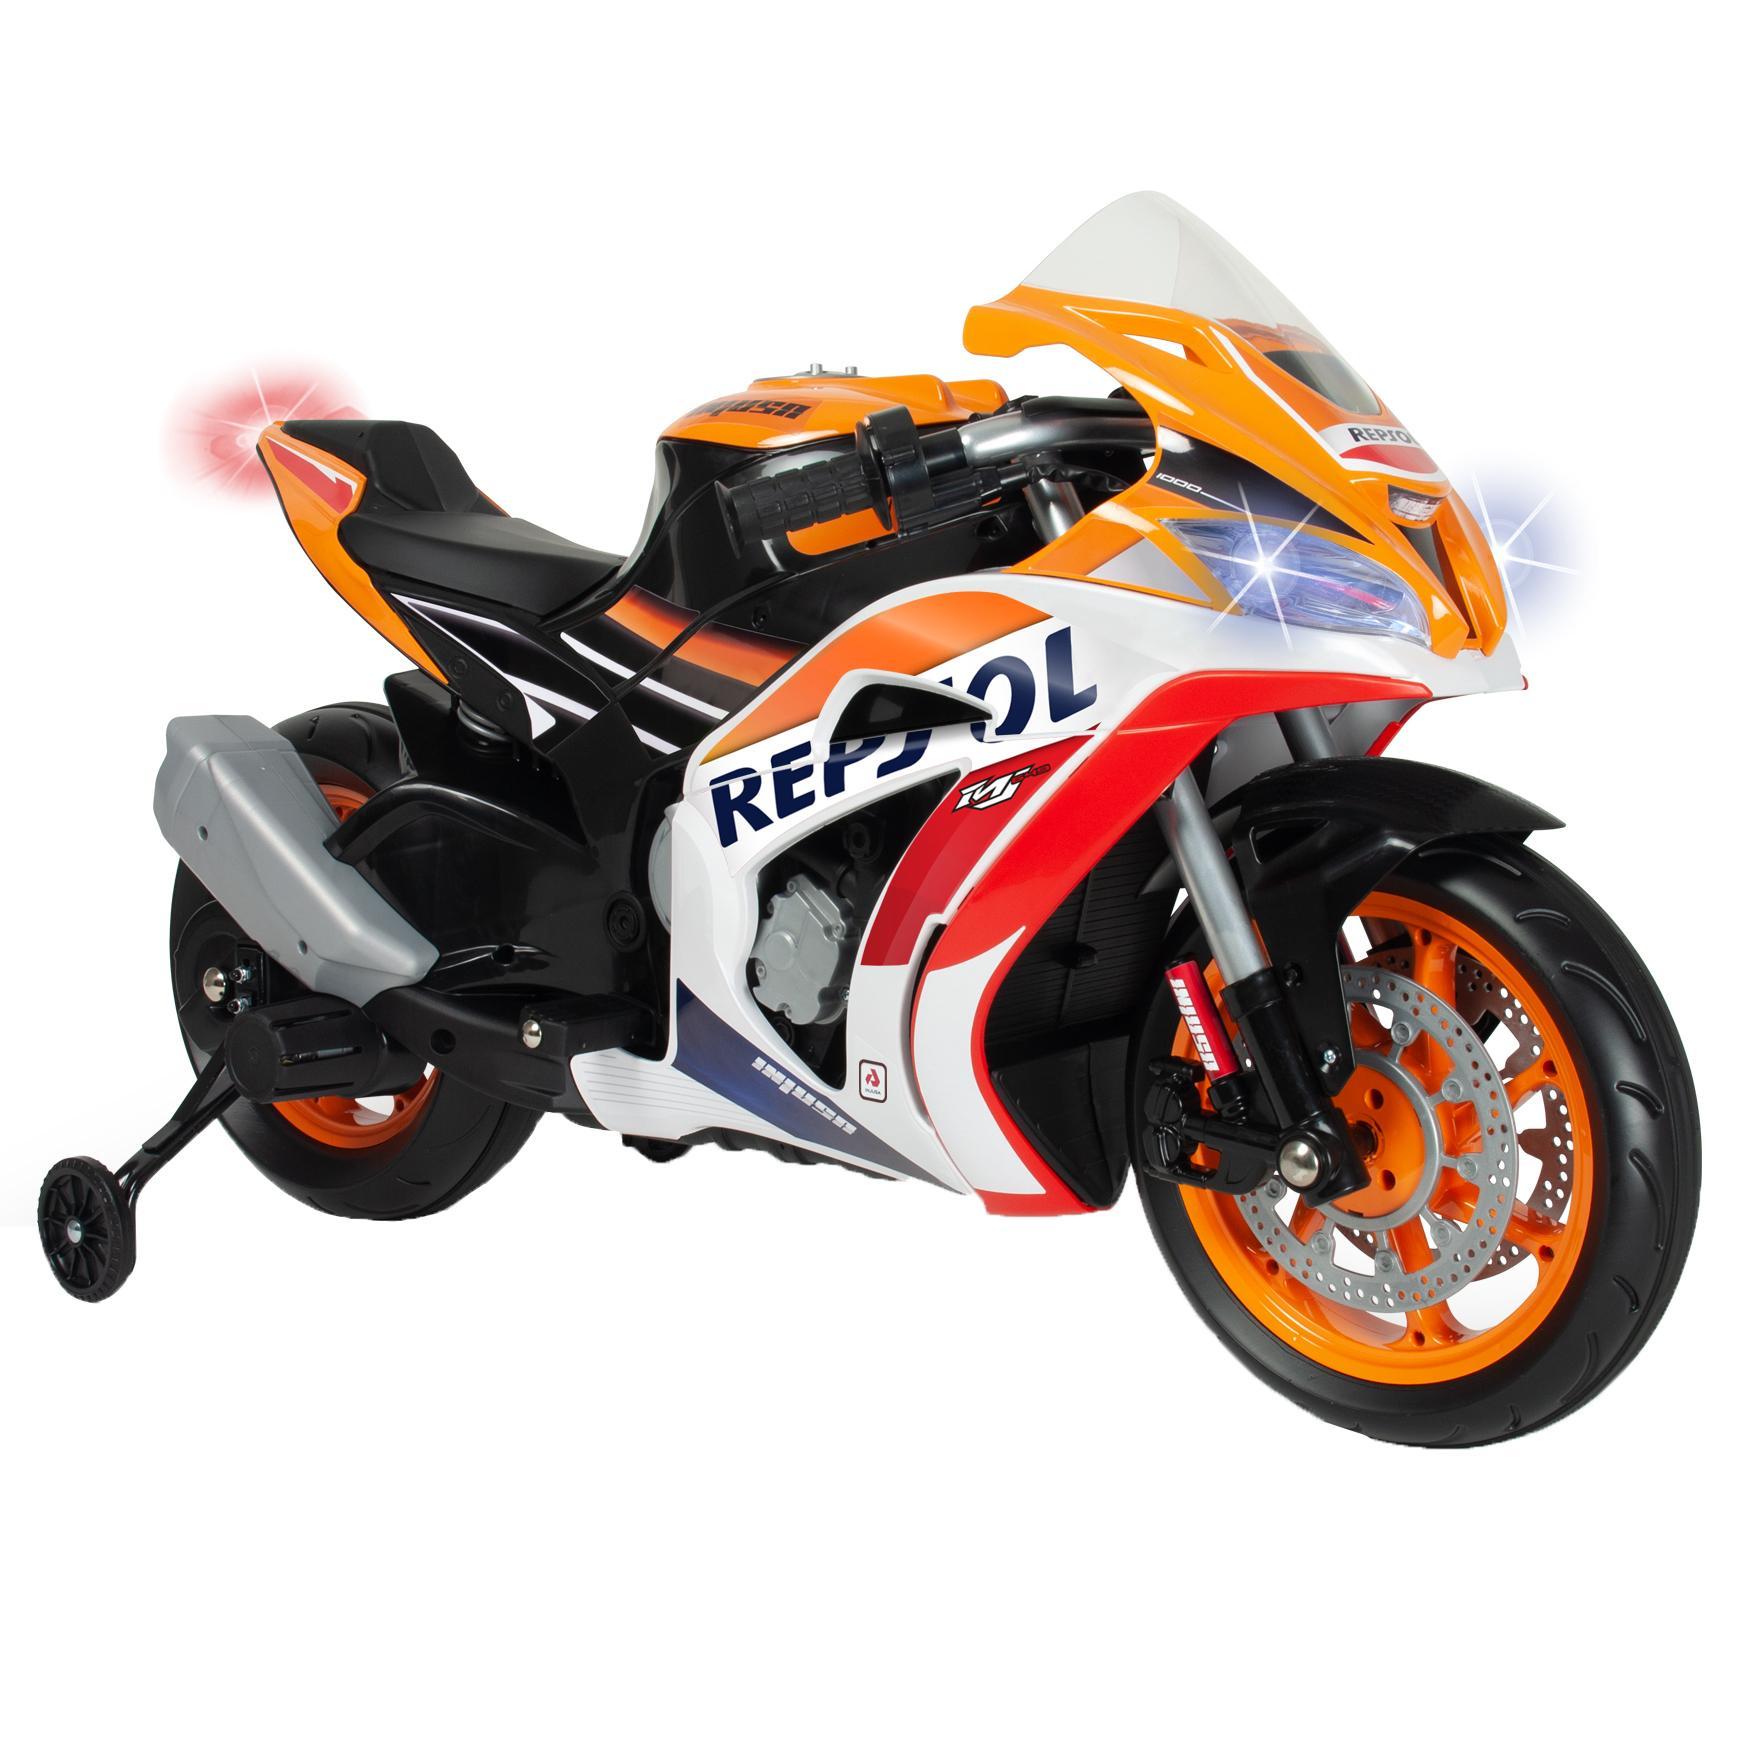 Fotografie Motocicleta electrica pentru copii Injusa, 12V - Honda Repsol Naked